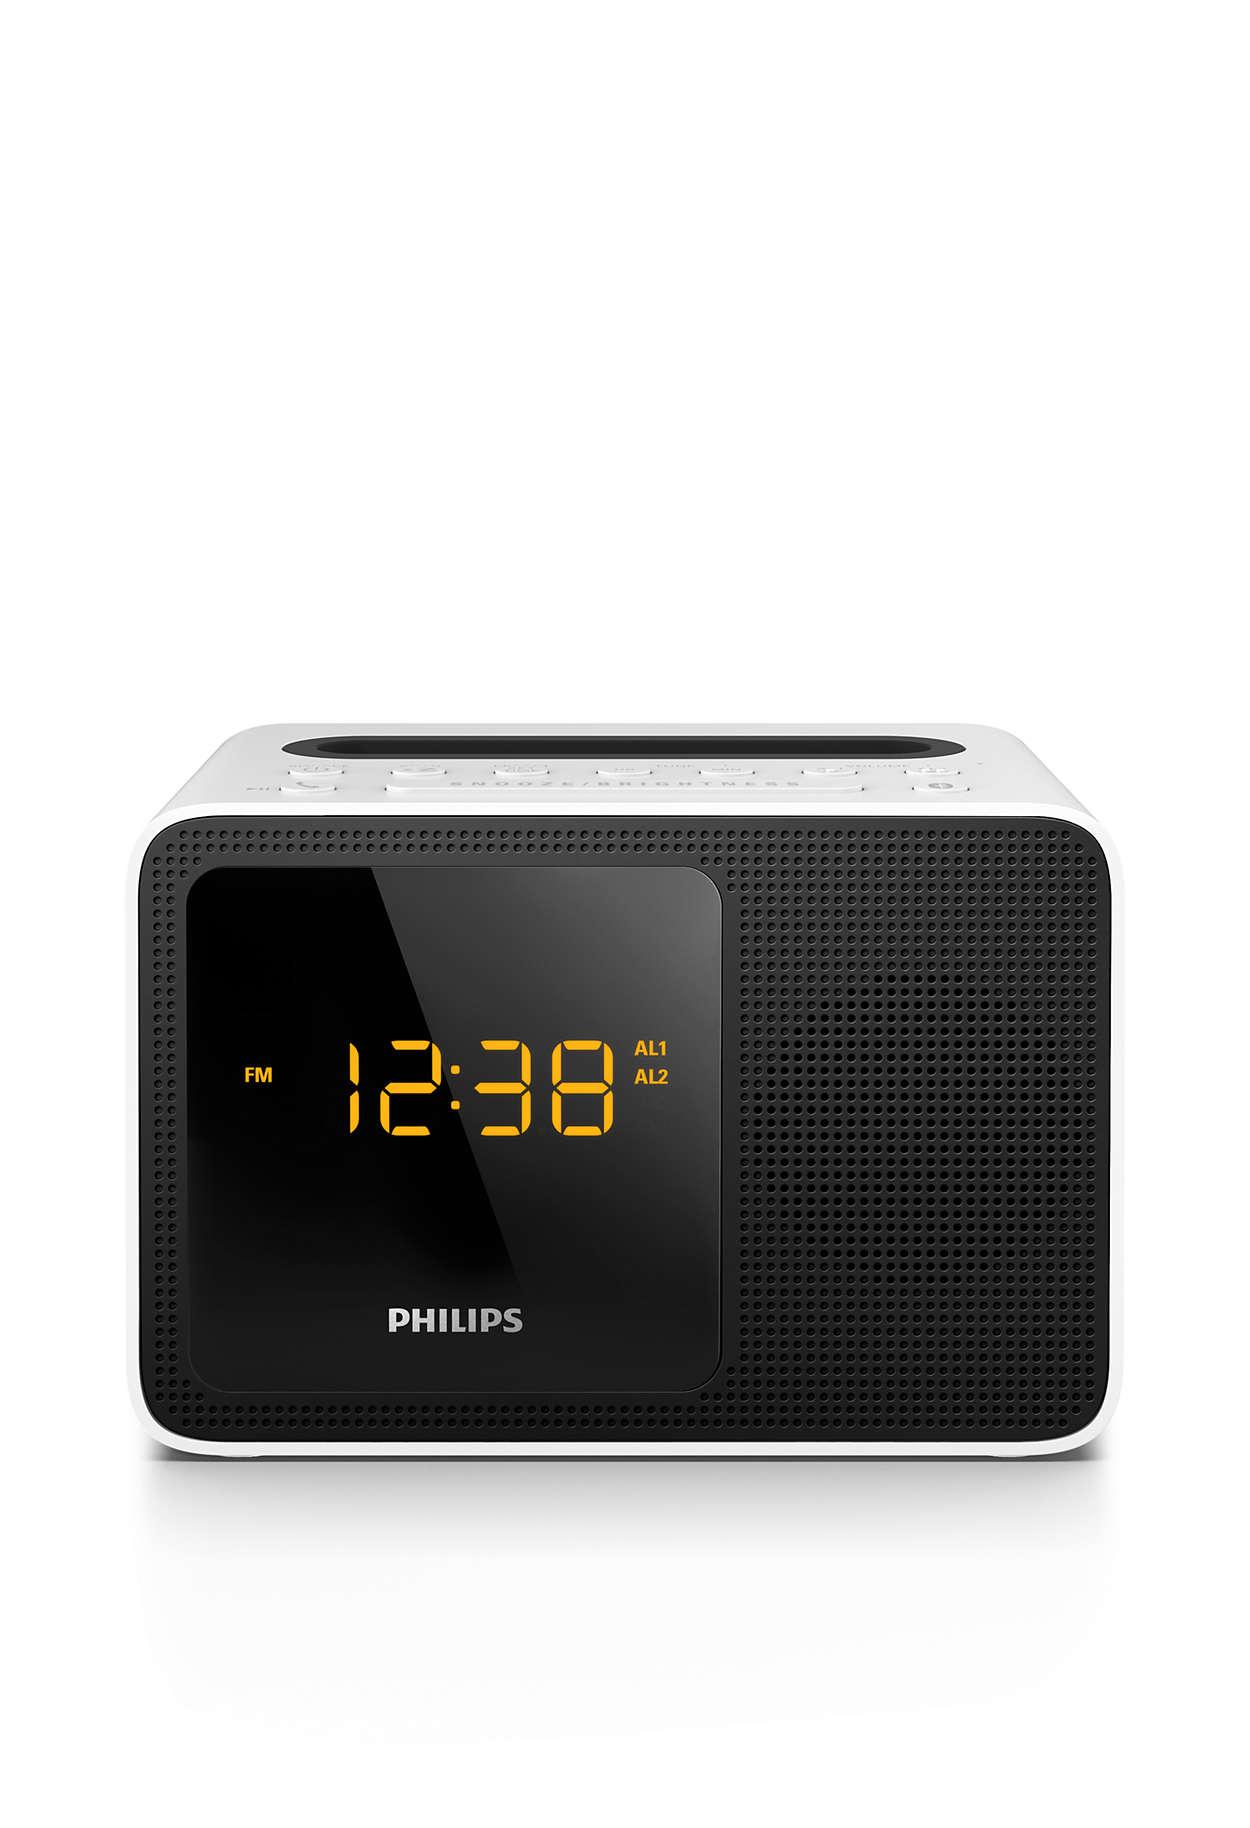 Clock Radio Ajt5300w 12 Philips Kit Digital Fm Display Frequensi Counter Untuk Tuner